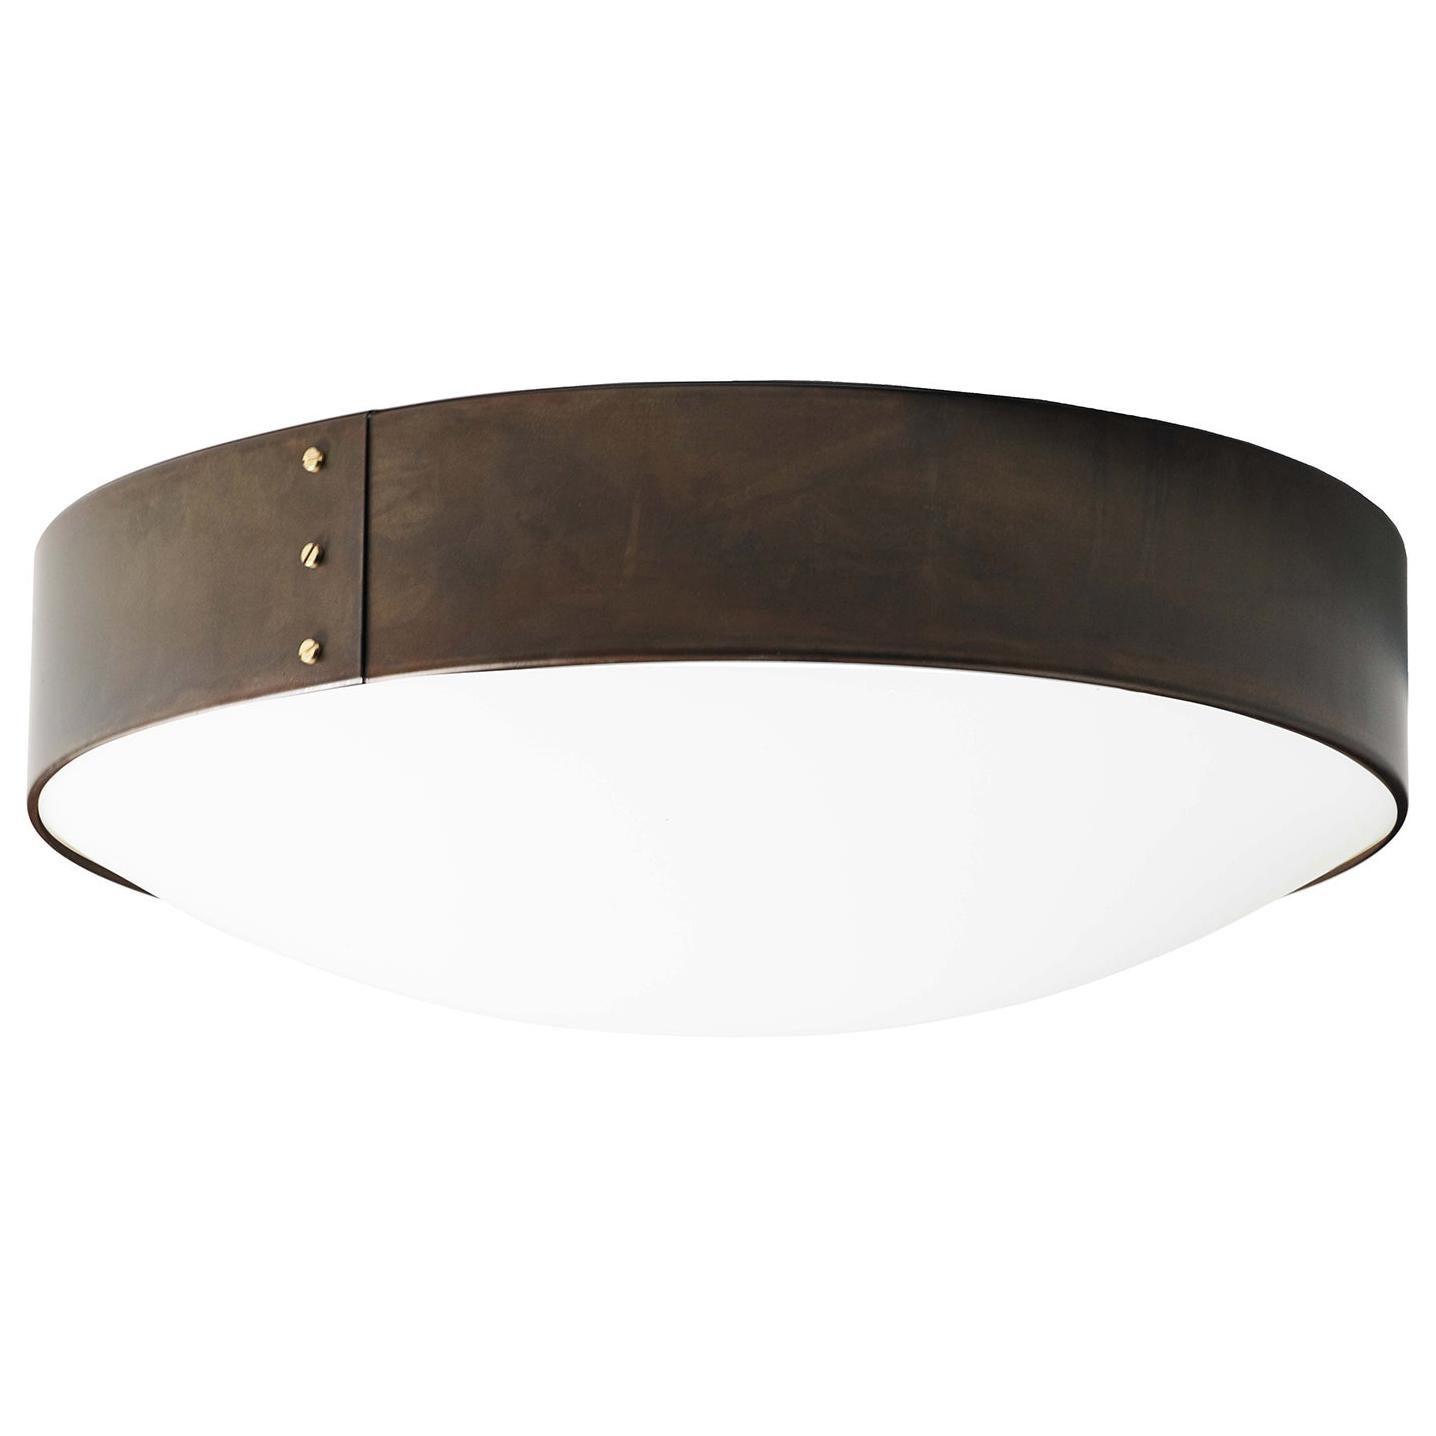 Konsthantverk Svep Large Iron Oxide Ceiling Lamp